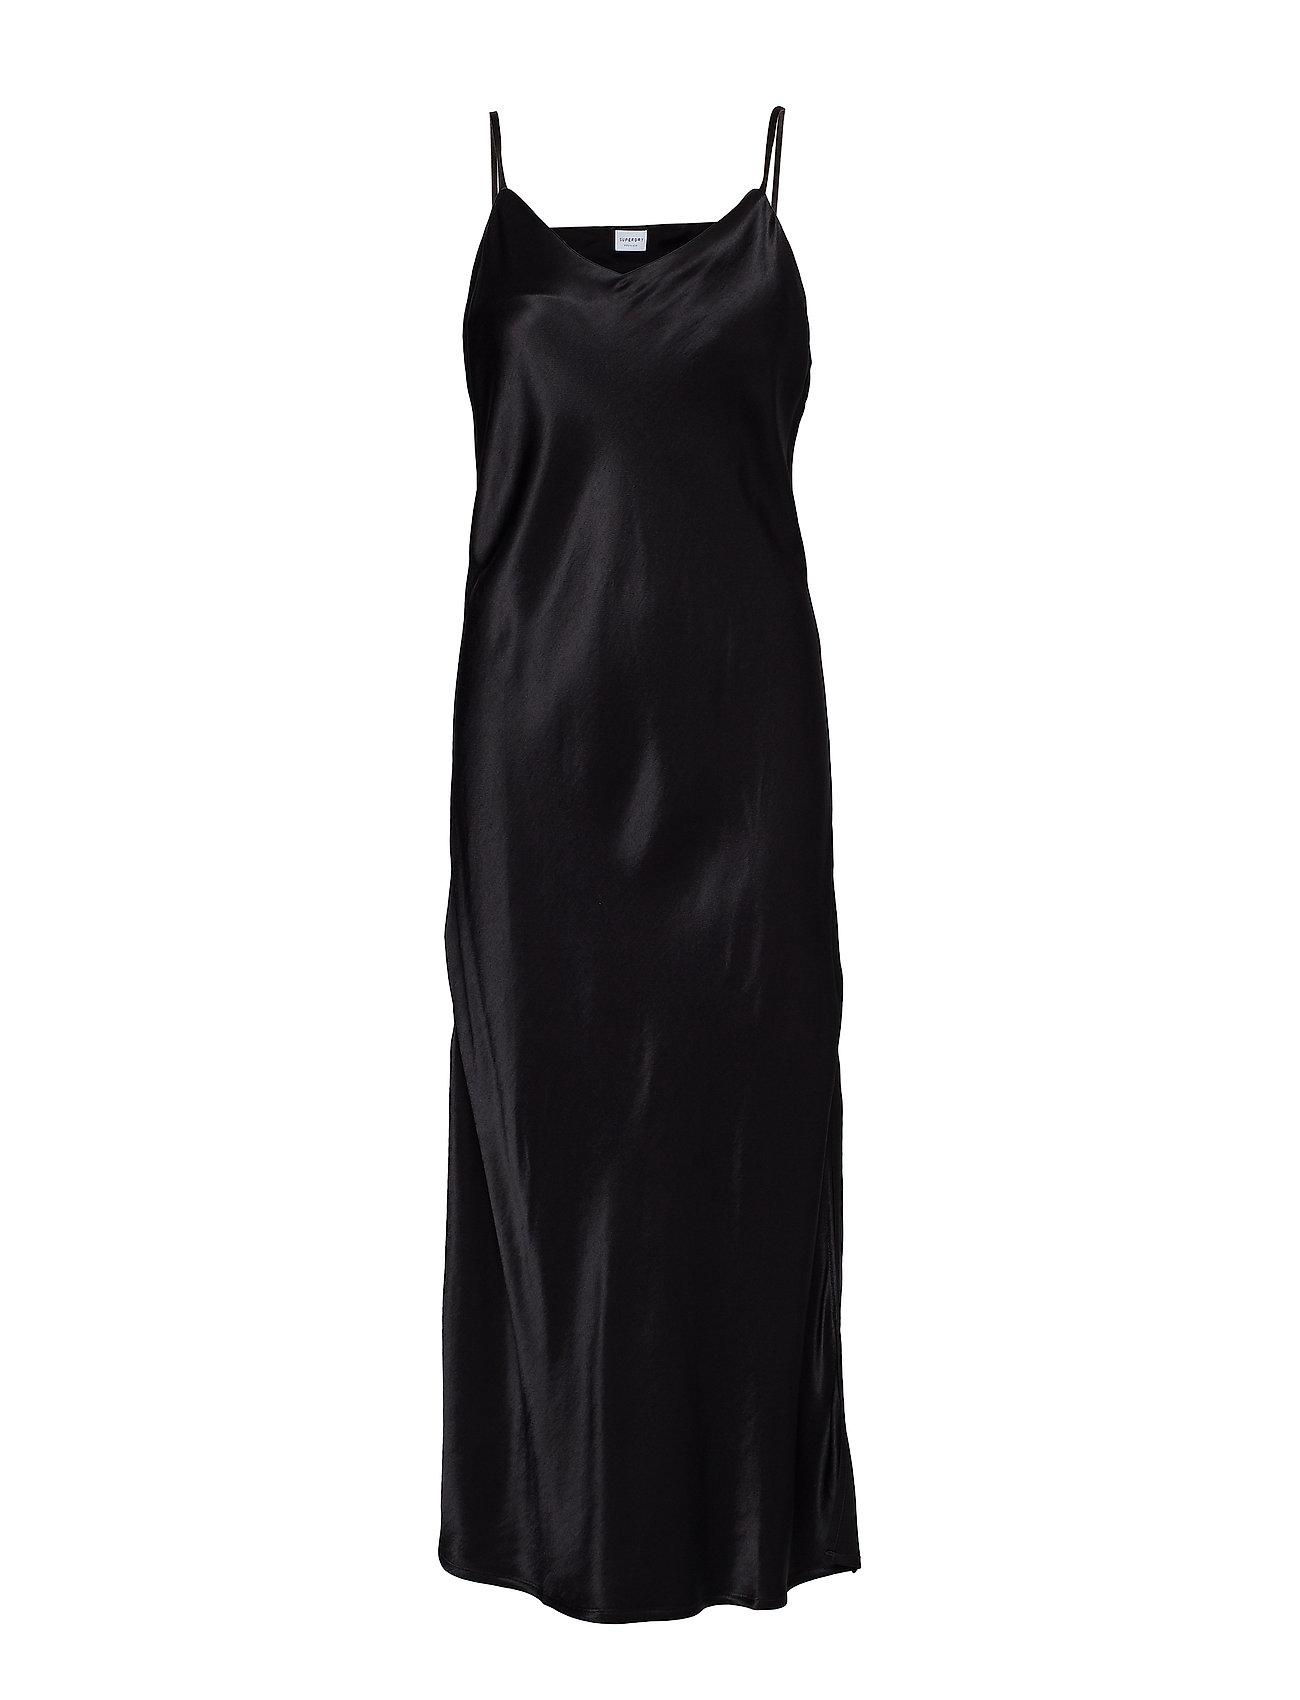 Superdry BIANCA SLIP DRESS